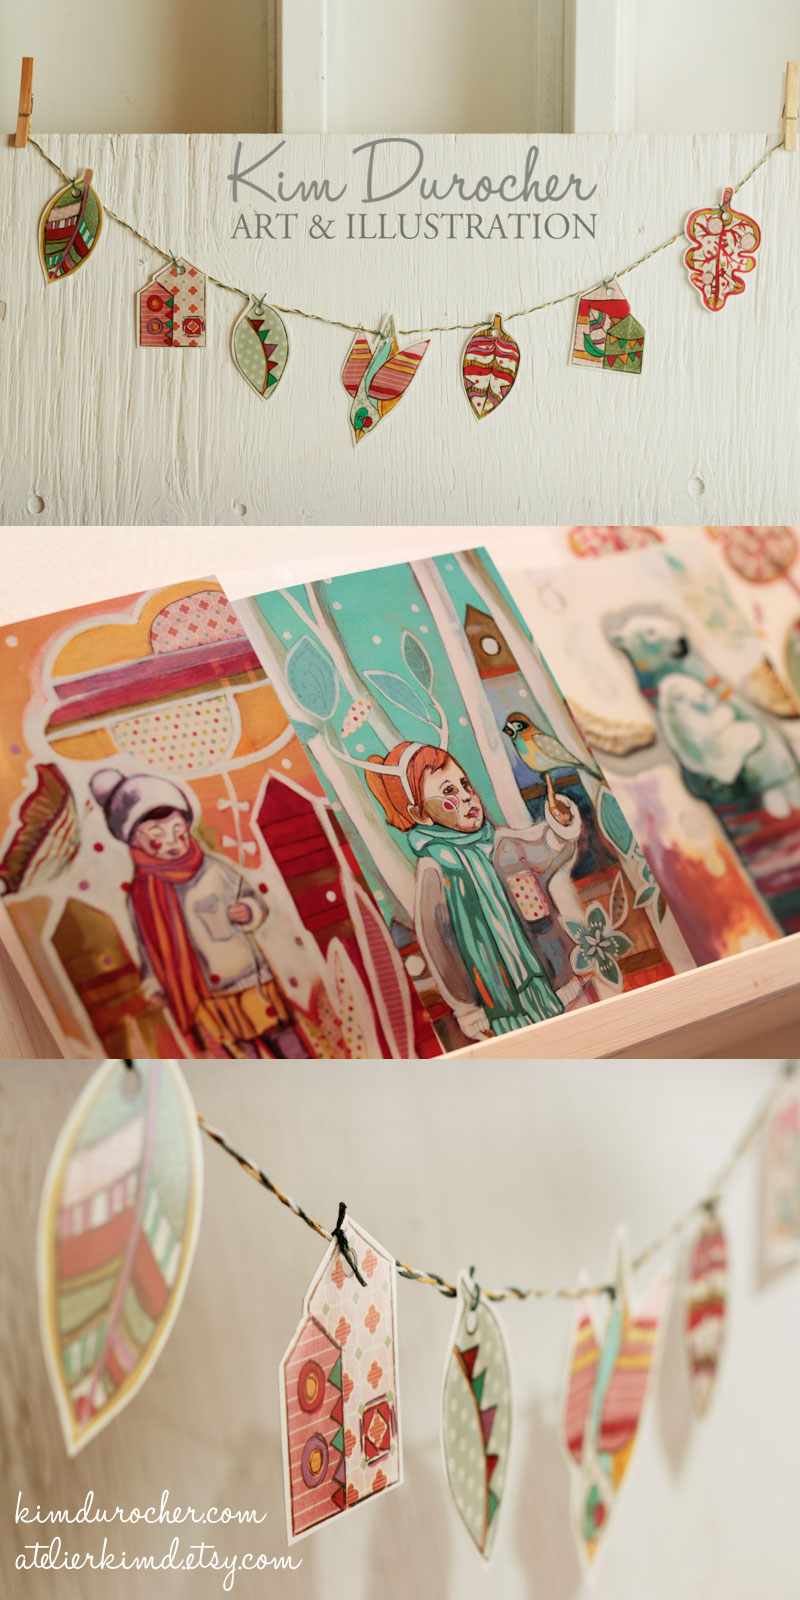 Illustrations de Kim Durocher. Collection hiver 2014-15